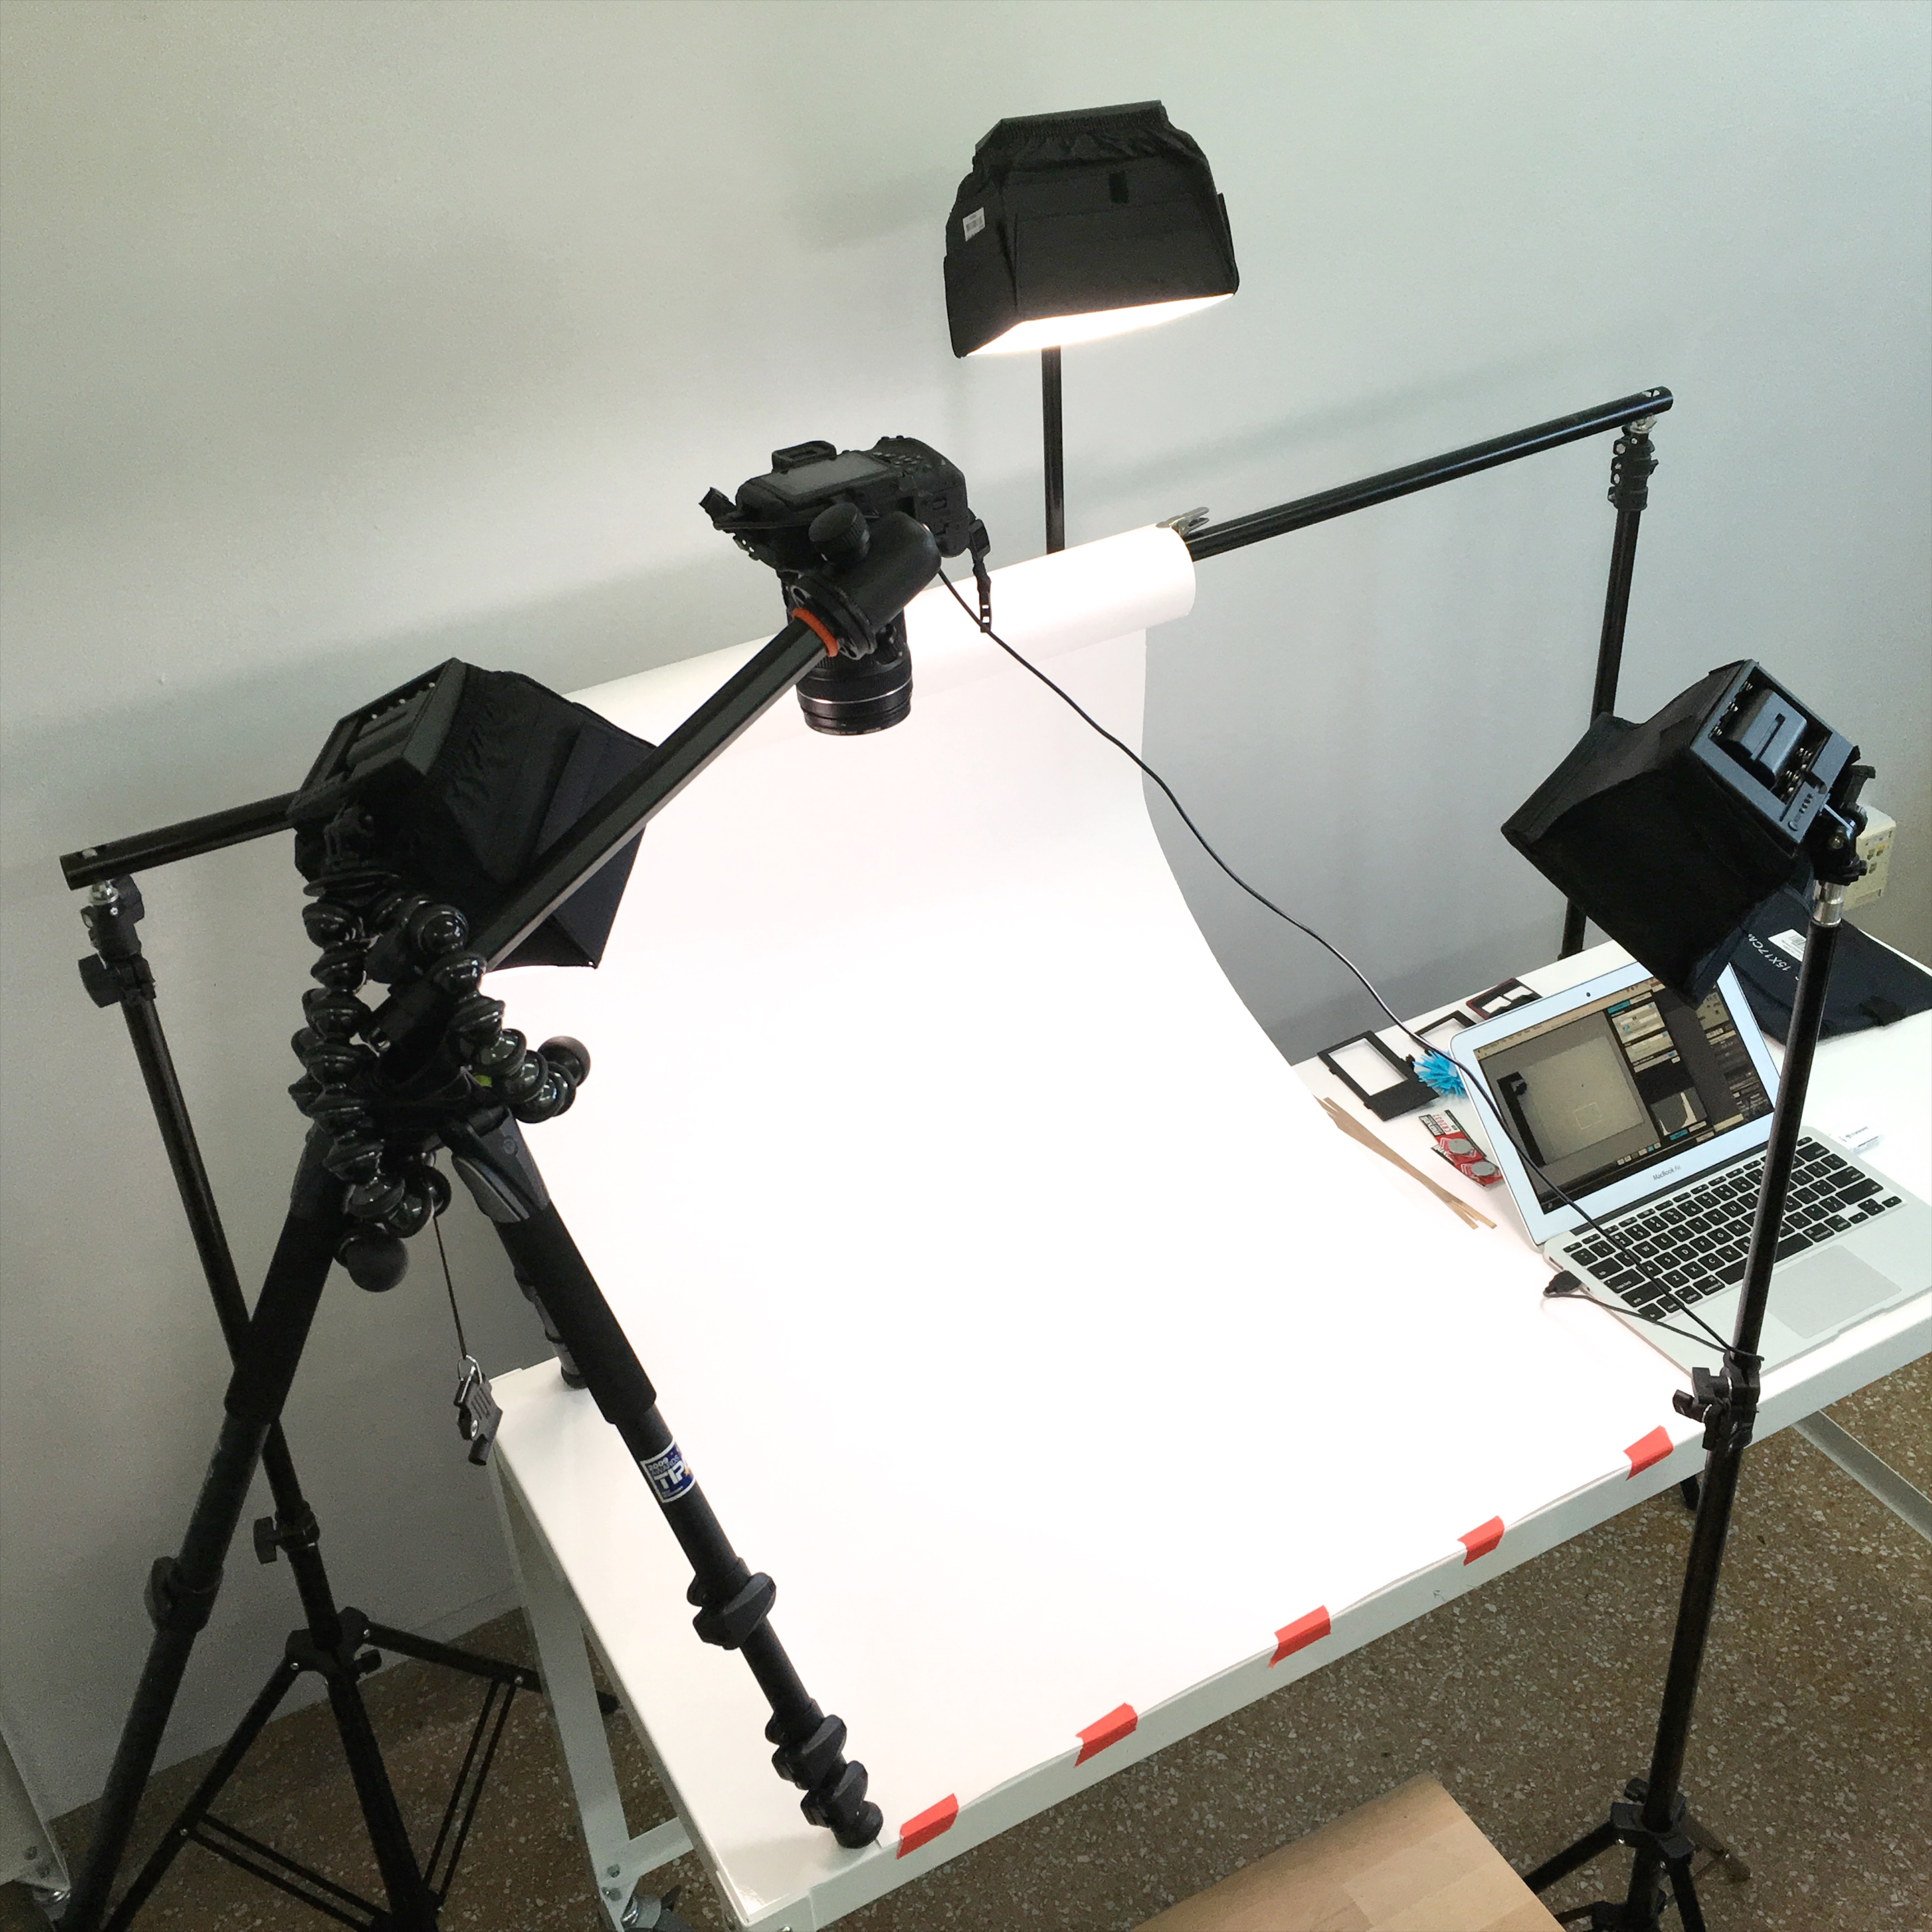 Launching A Kickstarter: Making the Video